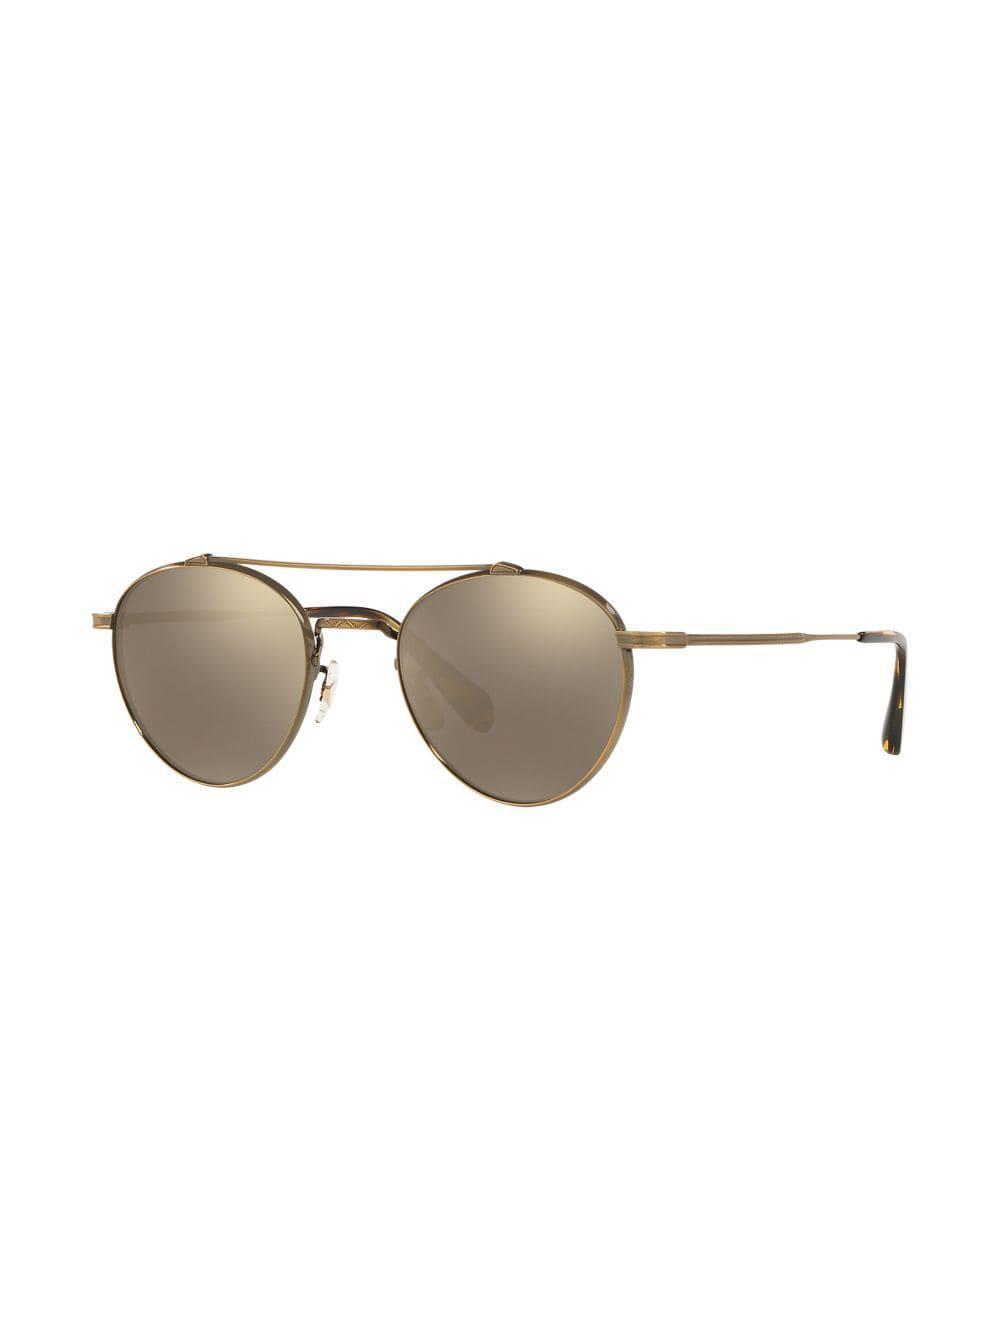 ad4d2b64de0 Oliver Peoples Watts Sun Sunglasses in Metallic for Men - Lyst